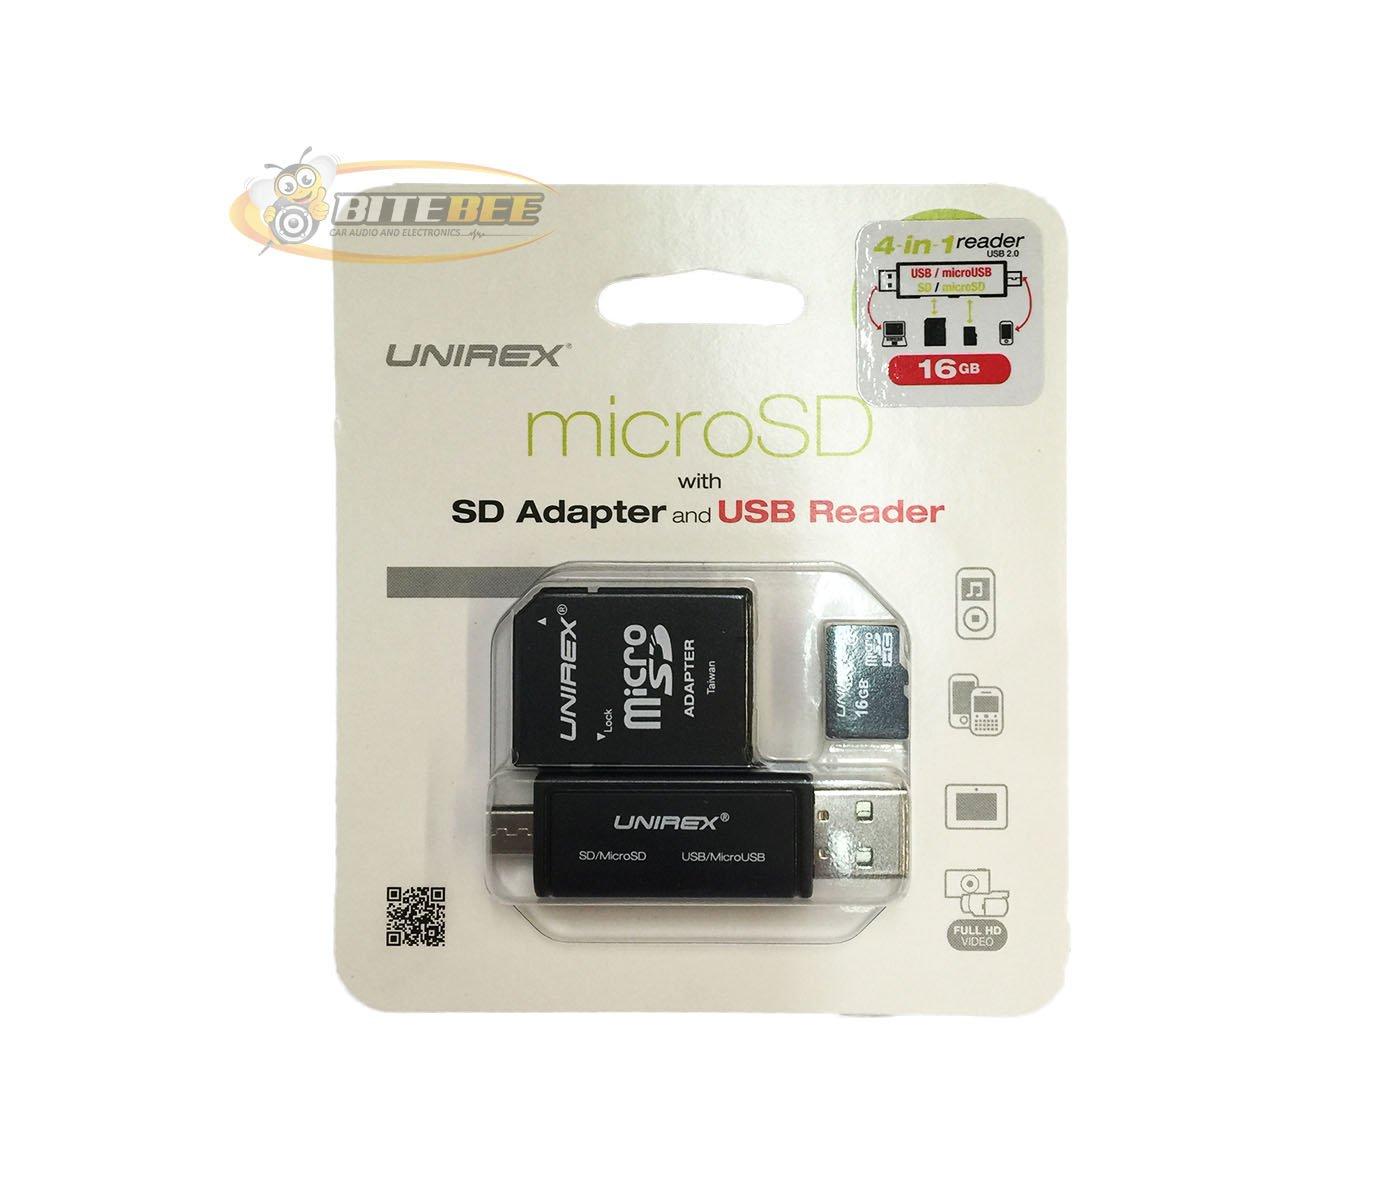 Amazon.com: Unirex MSW-165S 16GB UHS-1 Class 10 Micro SD ...